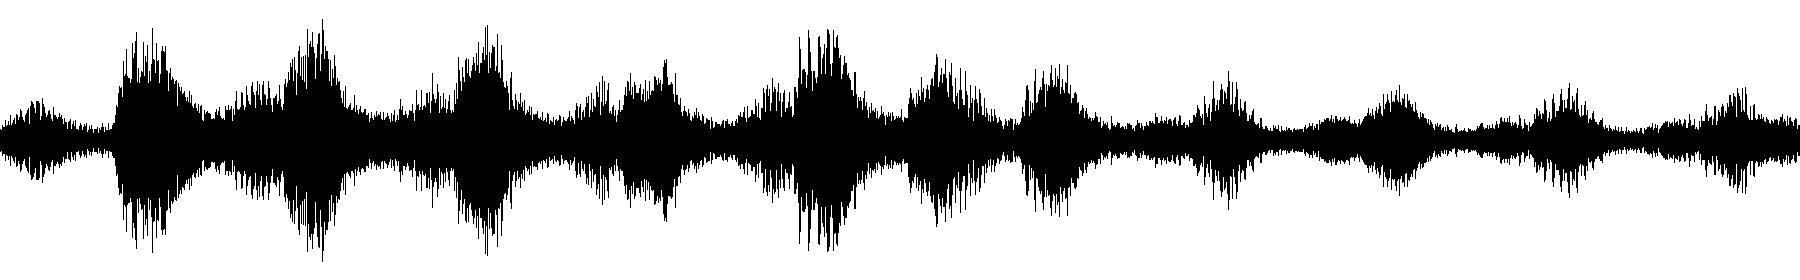 shs ch musicloop 127 piano2 cm